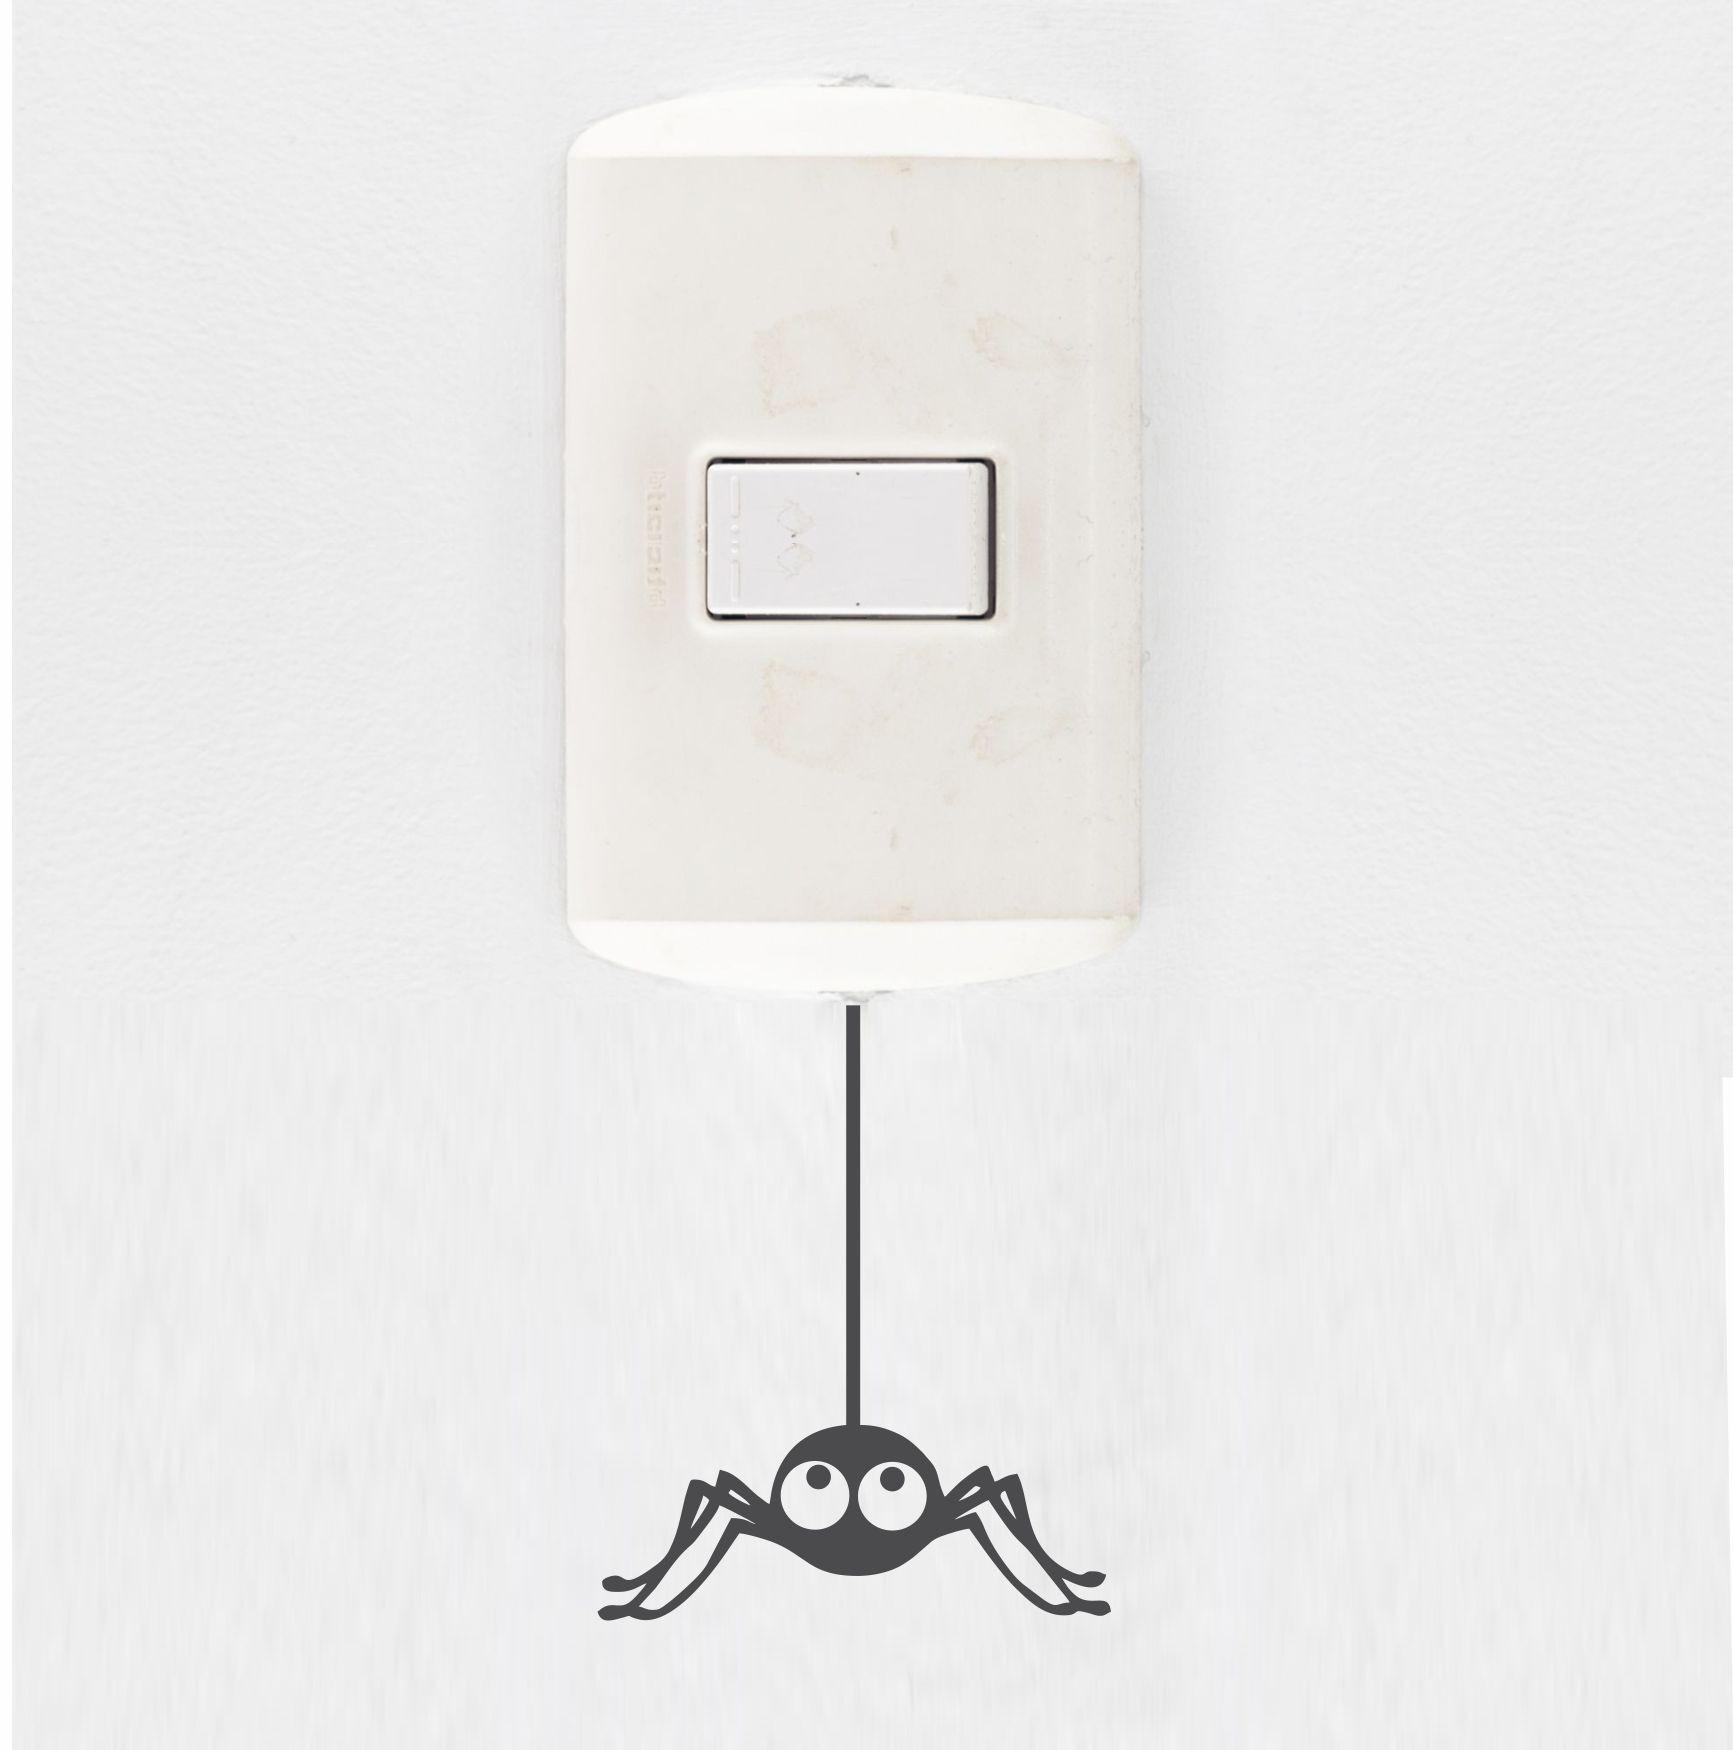 Adesivo de Interruptor e Tomada - Aranha